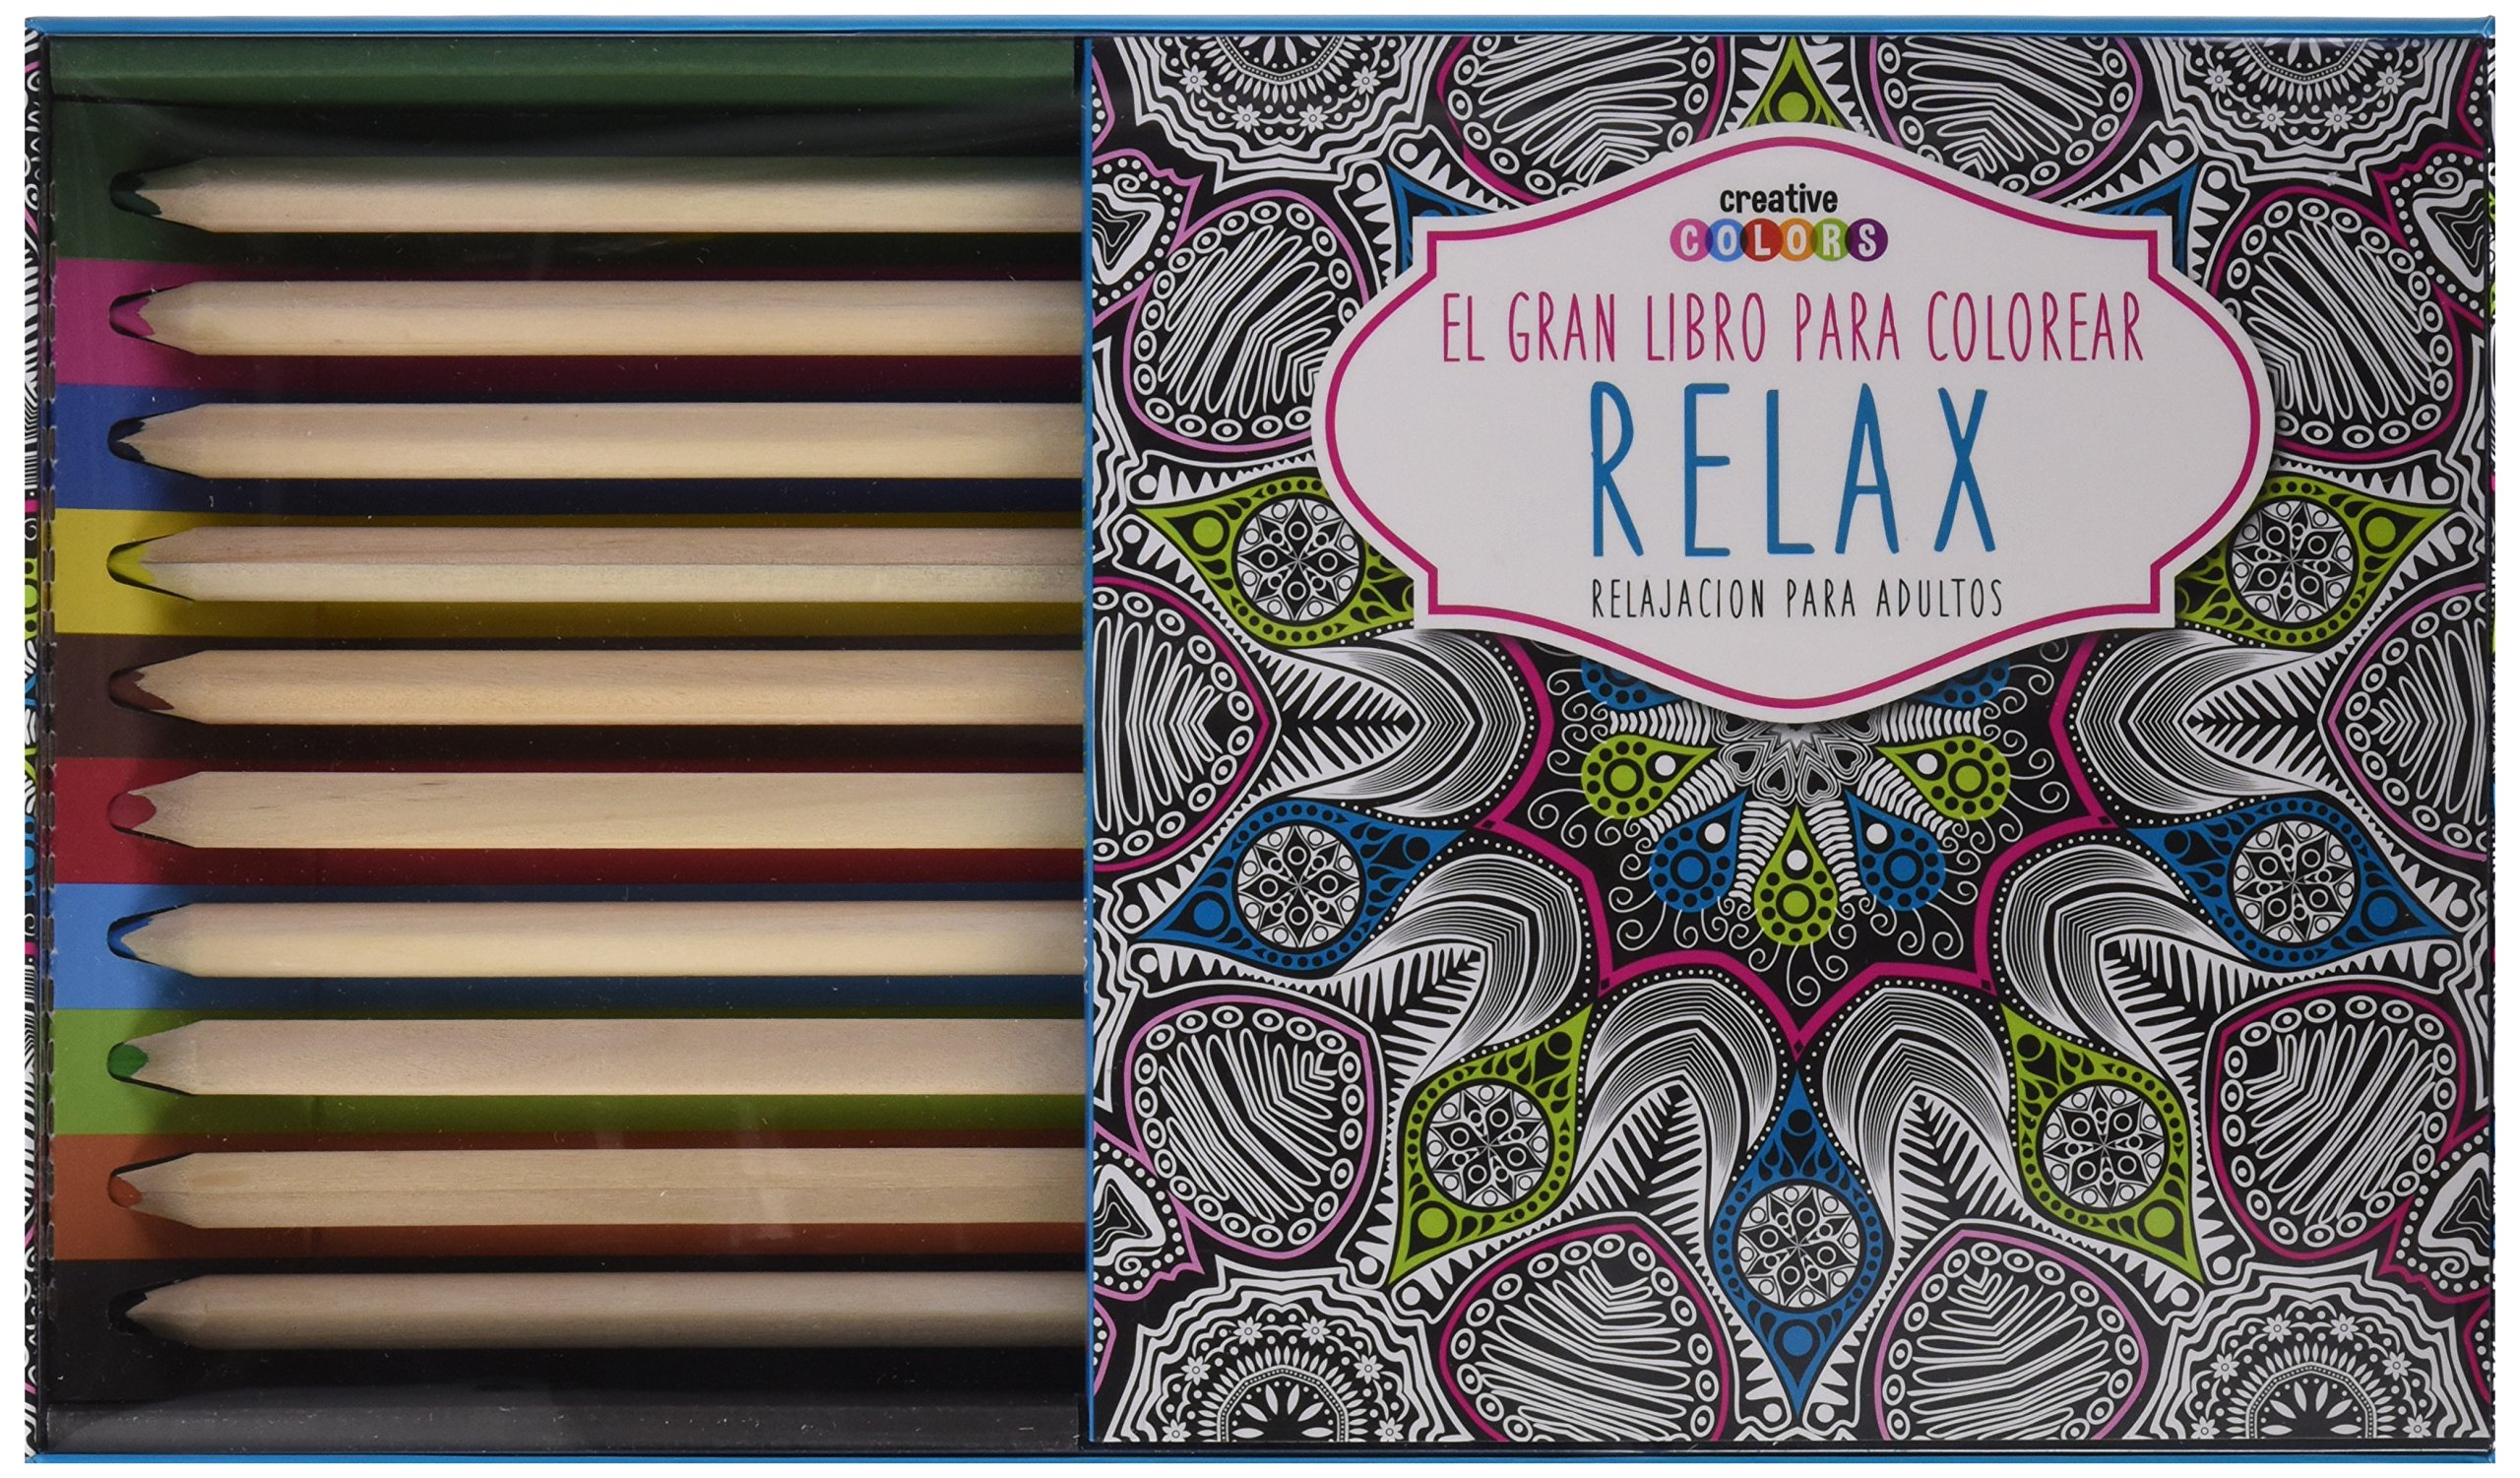 Gran Libro Para Colorear Relax Con Lapices: Amazon.es: Vv.Aa: Libros